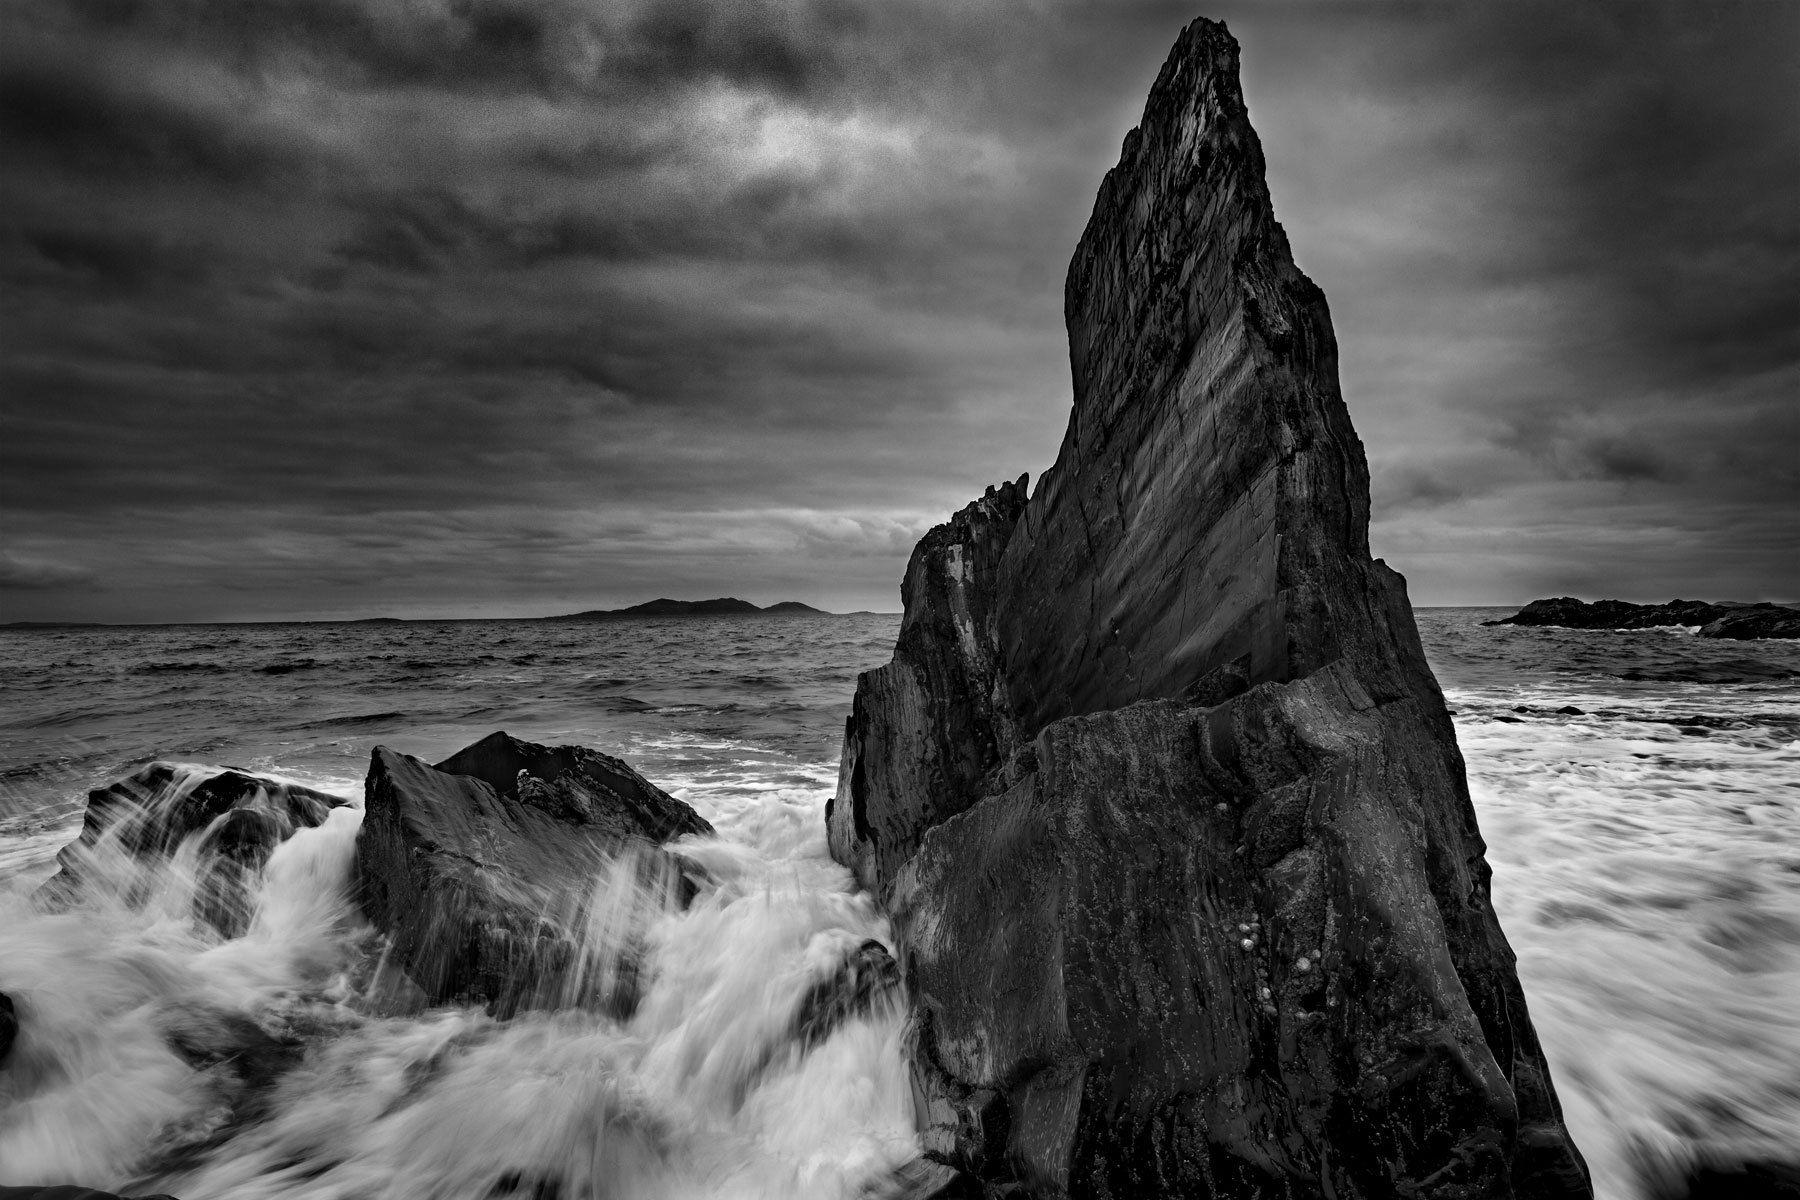 Baranbaun Point, County Mayo, Ireland